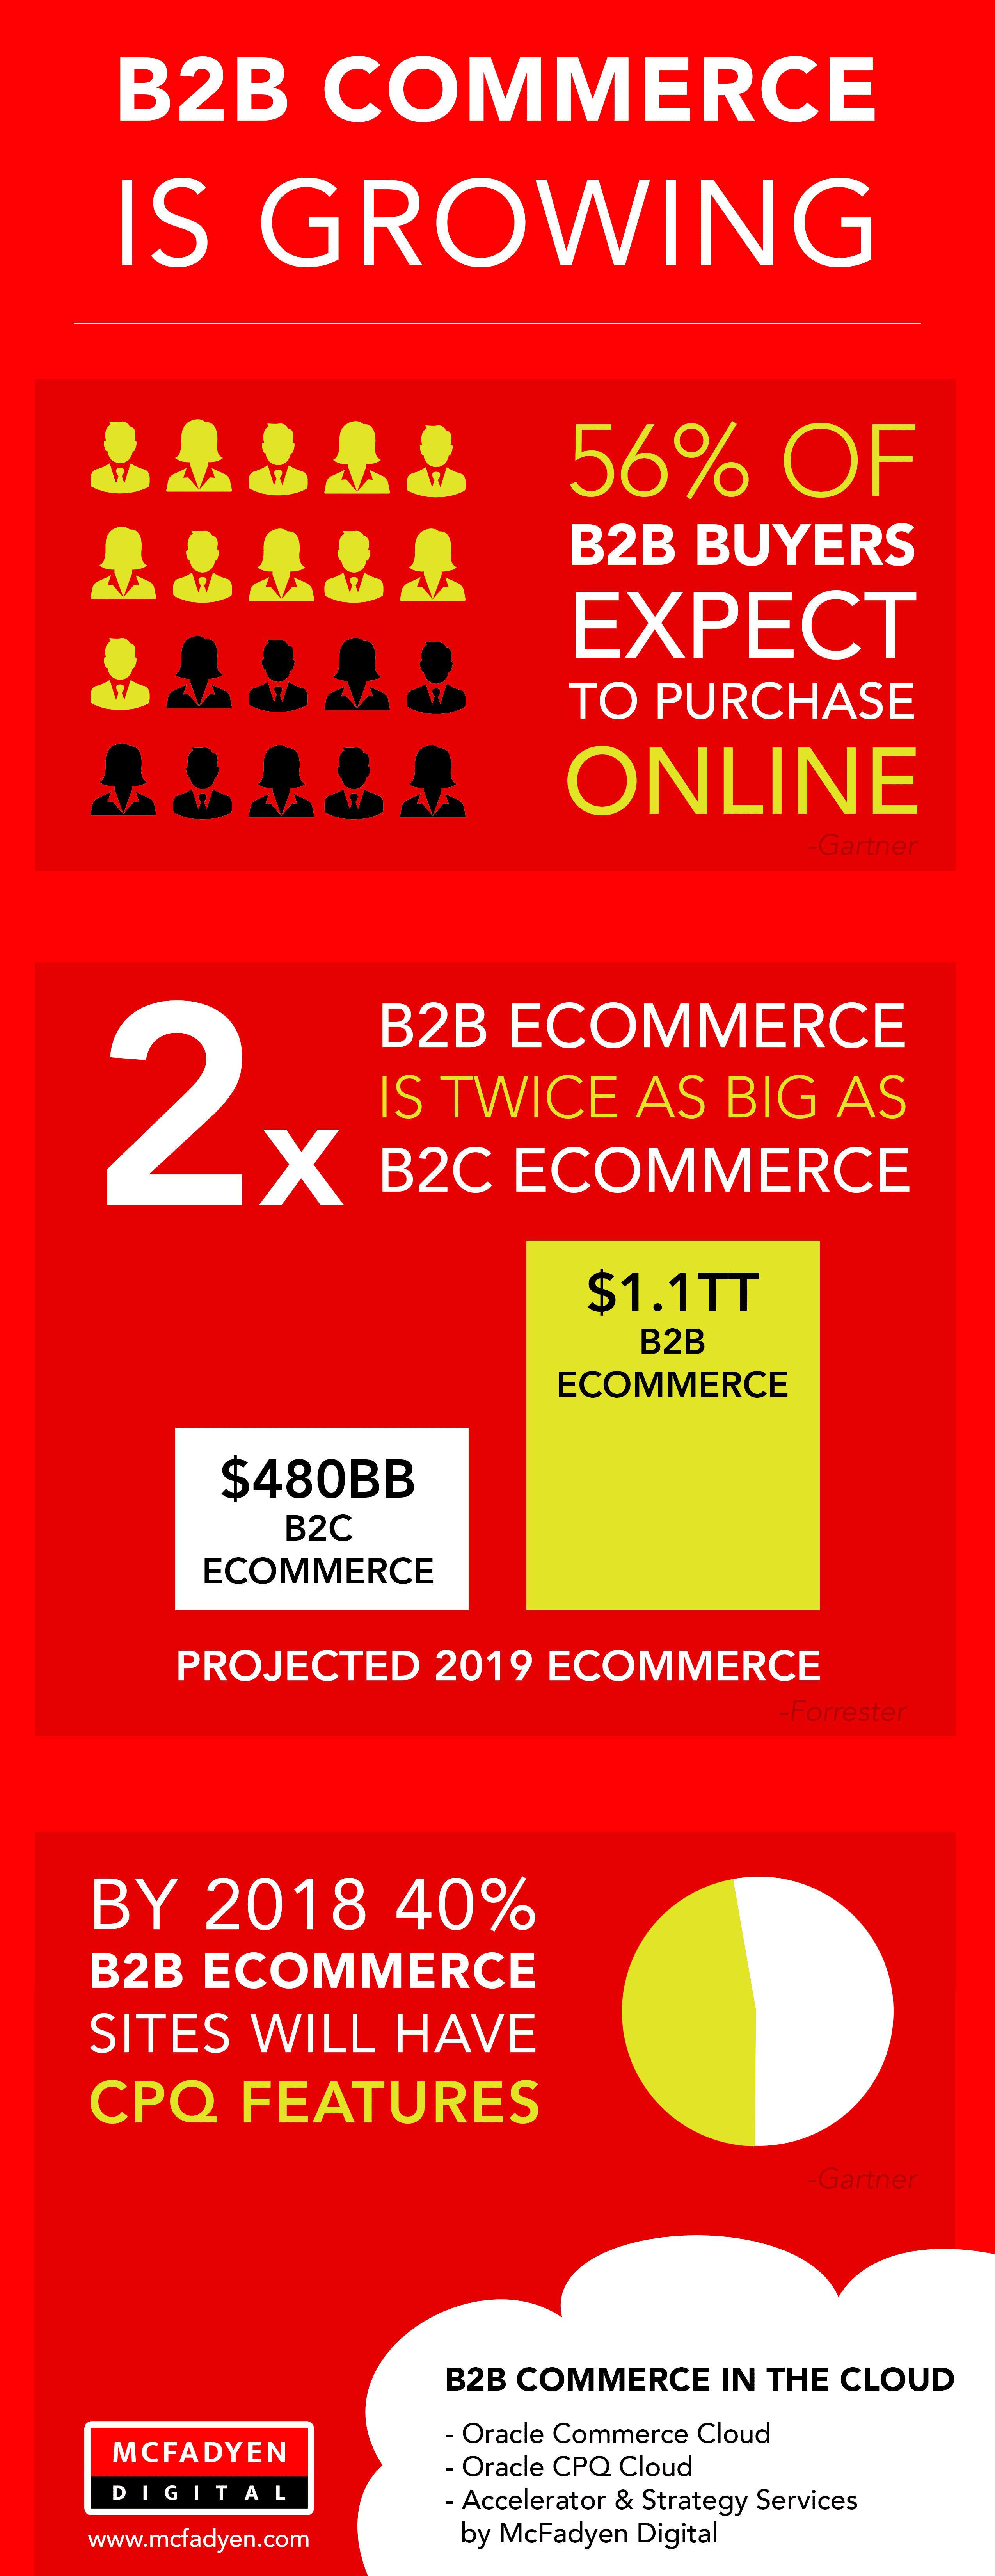 B2B Ecommerce Business is Growing - McFadyen Digital